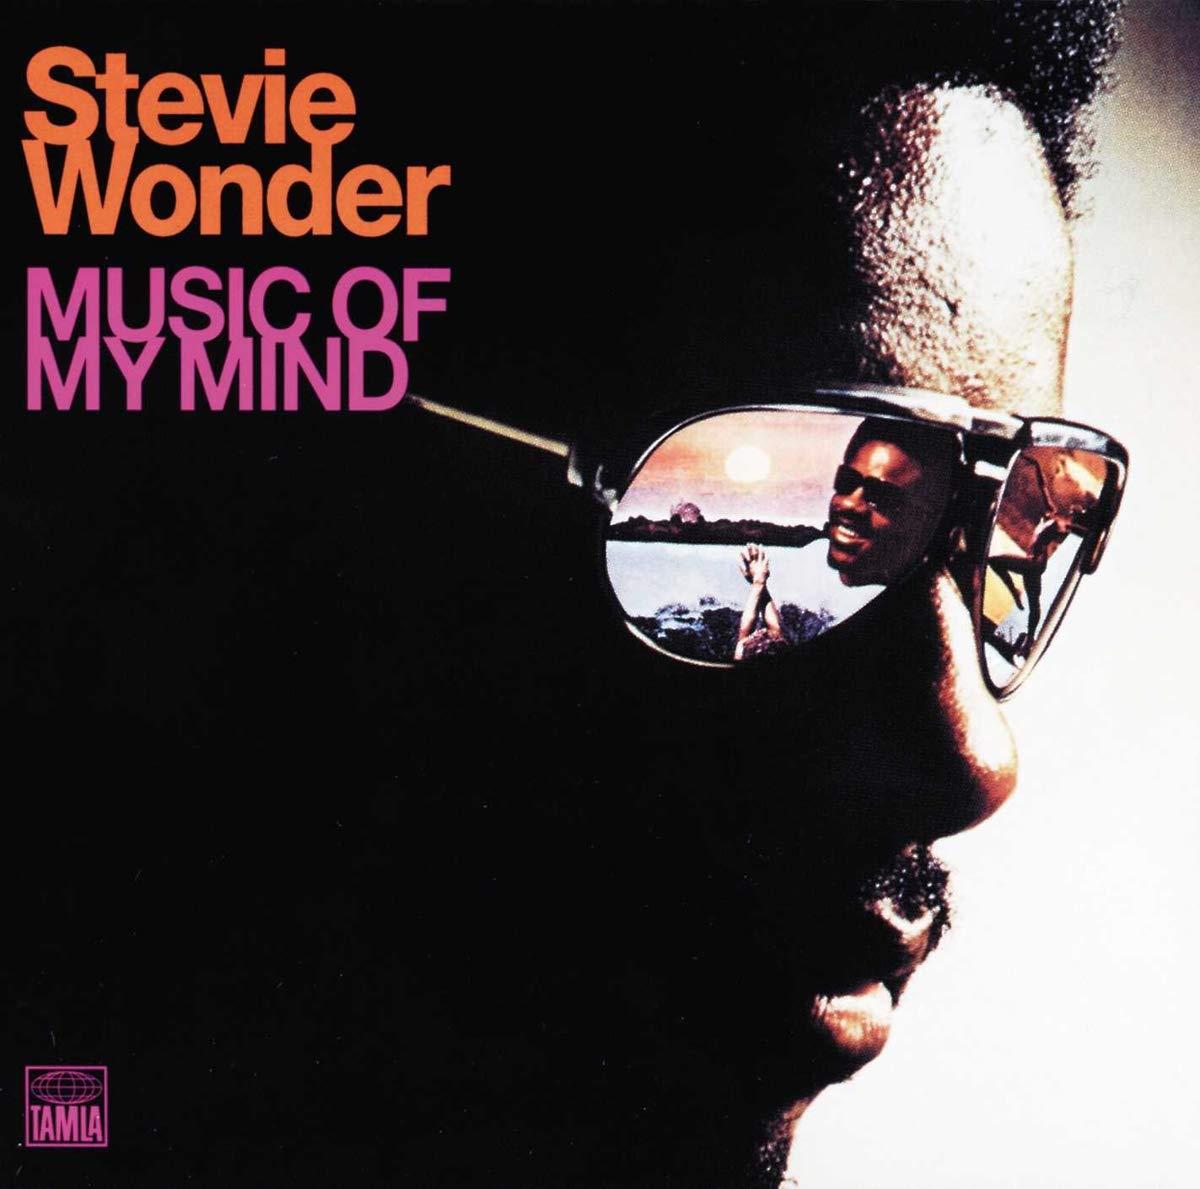 Stevie Wonder - CD Music of My Mind